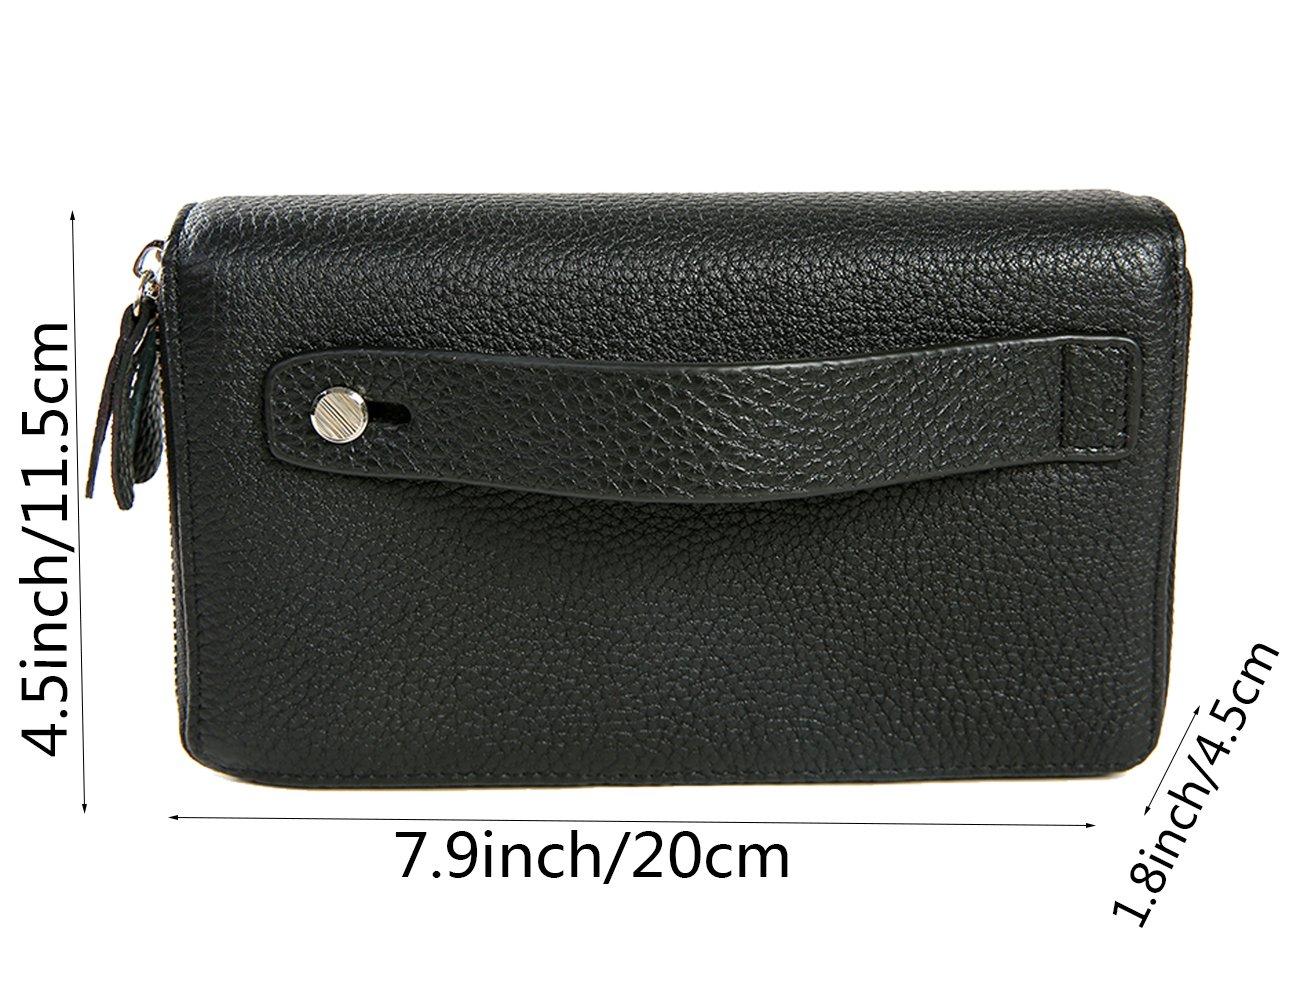 iSuperb Men Leather Clutch Wristlet Classy Zipper Large Capacity Wallet Purse for iPhone 6 6s 6plus 6splus 7 7plus 7.9x4.5x1.8 inches Black